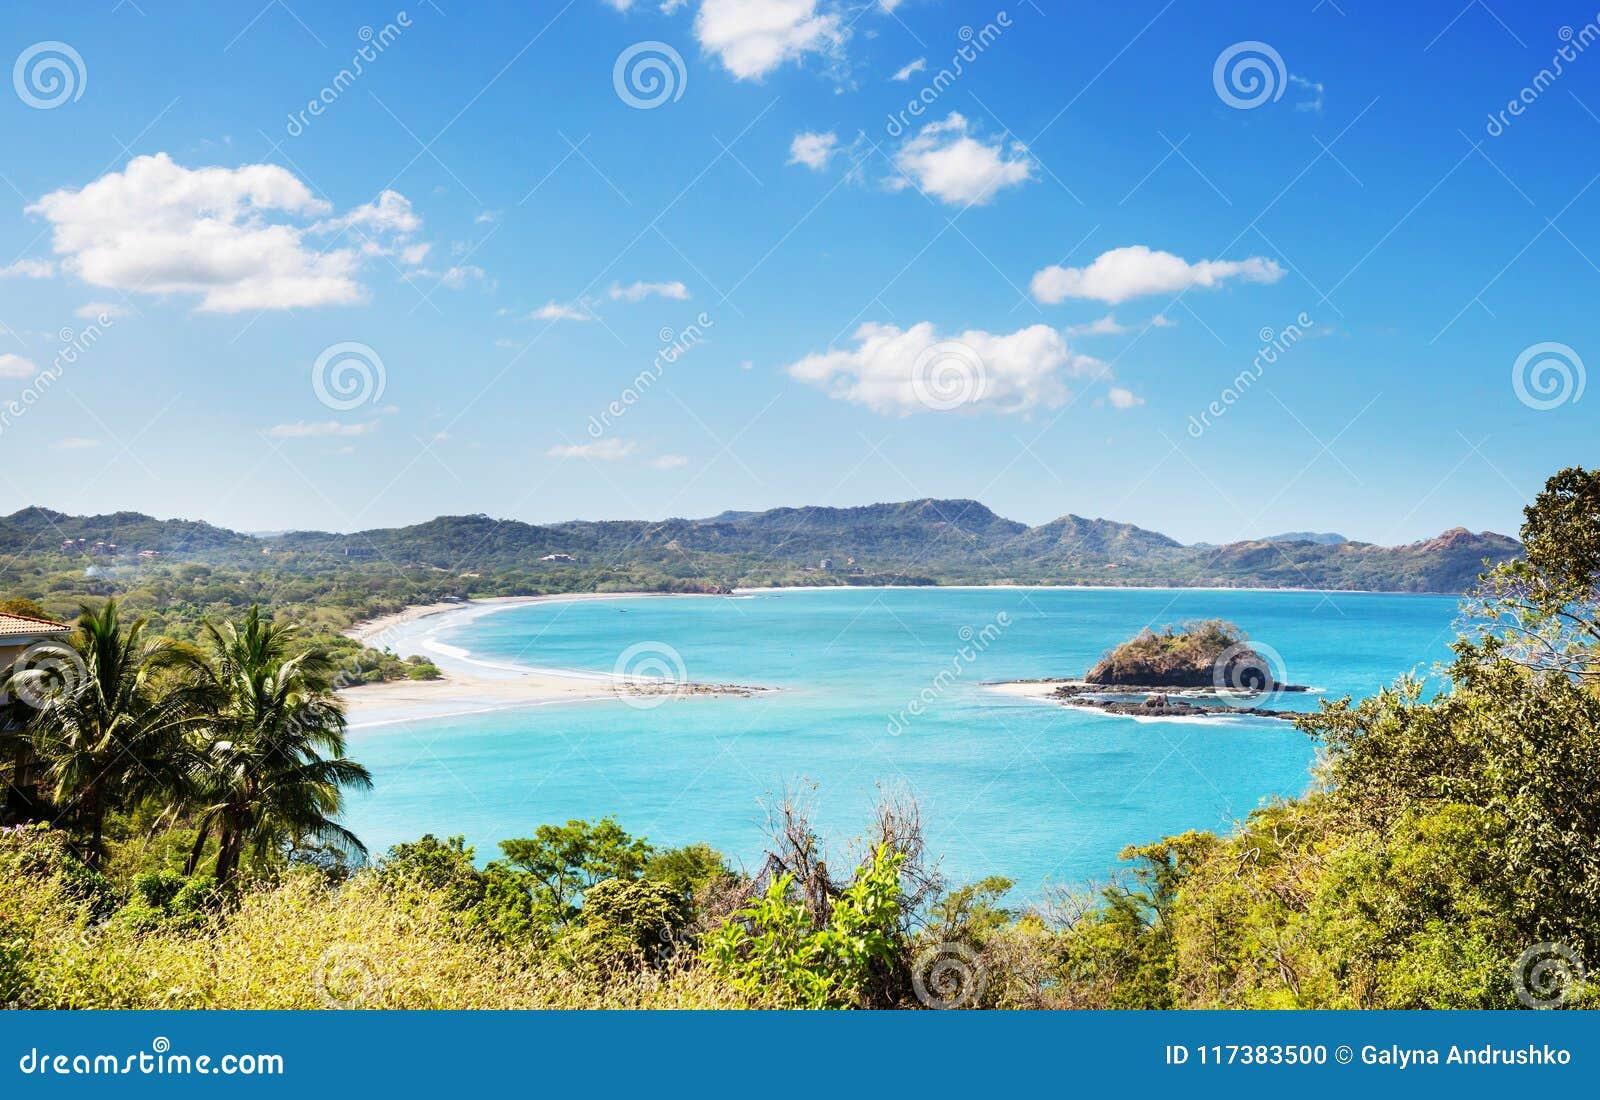 Costa en Costa Rica